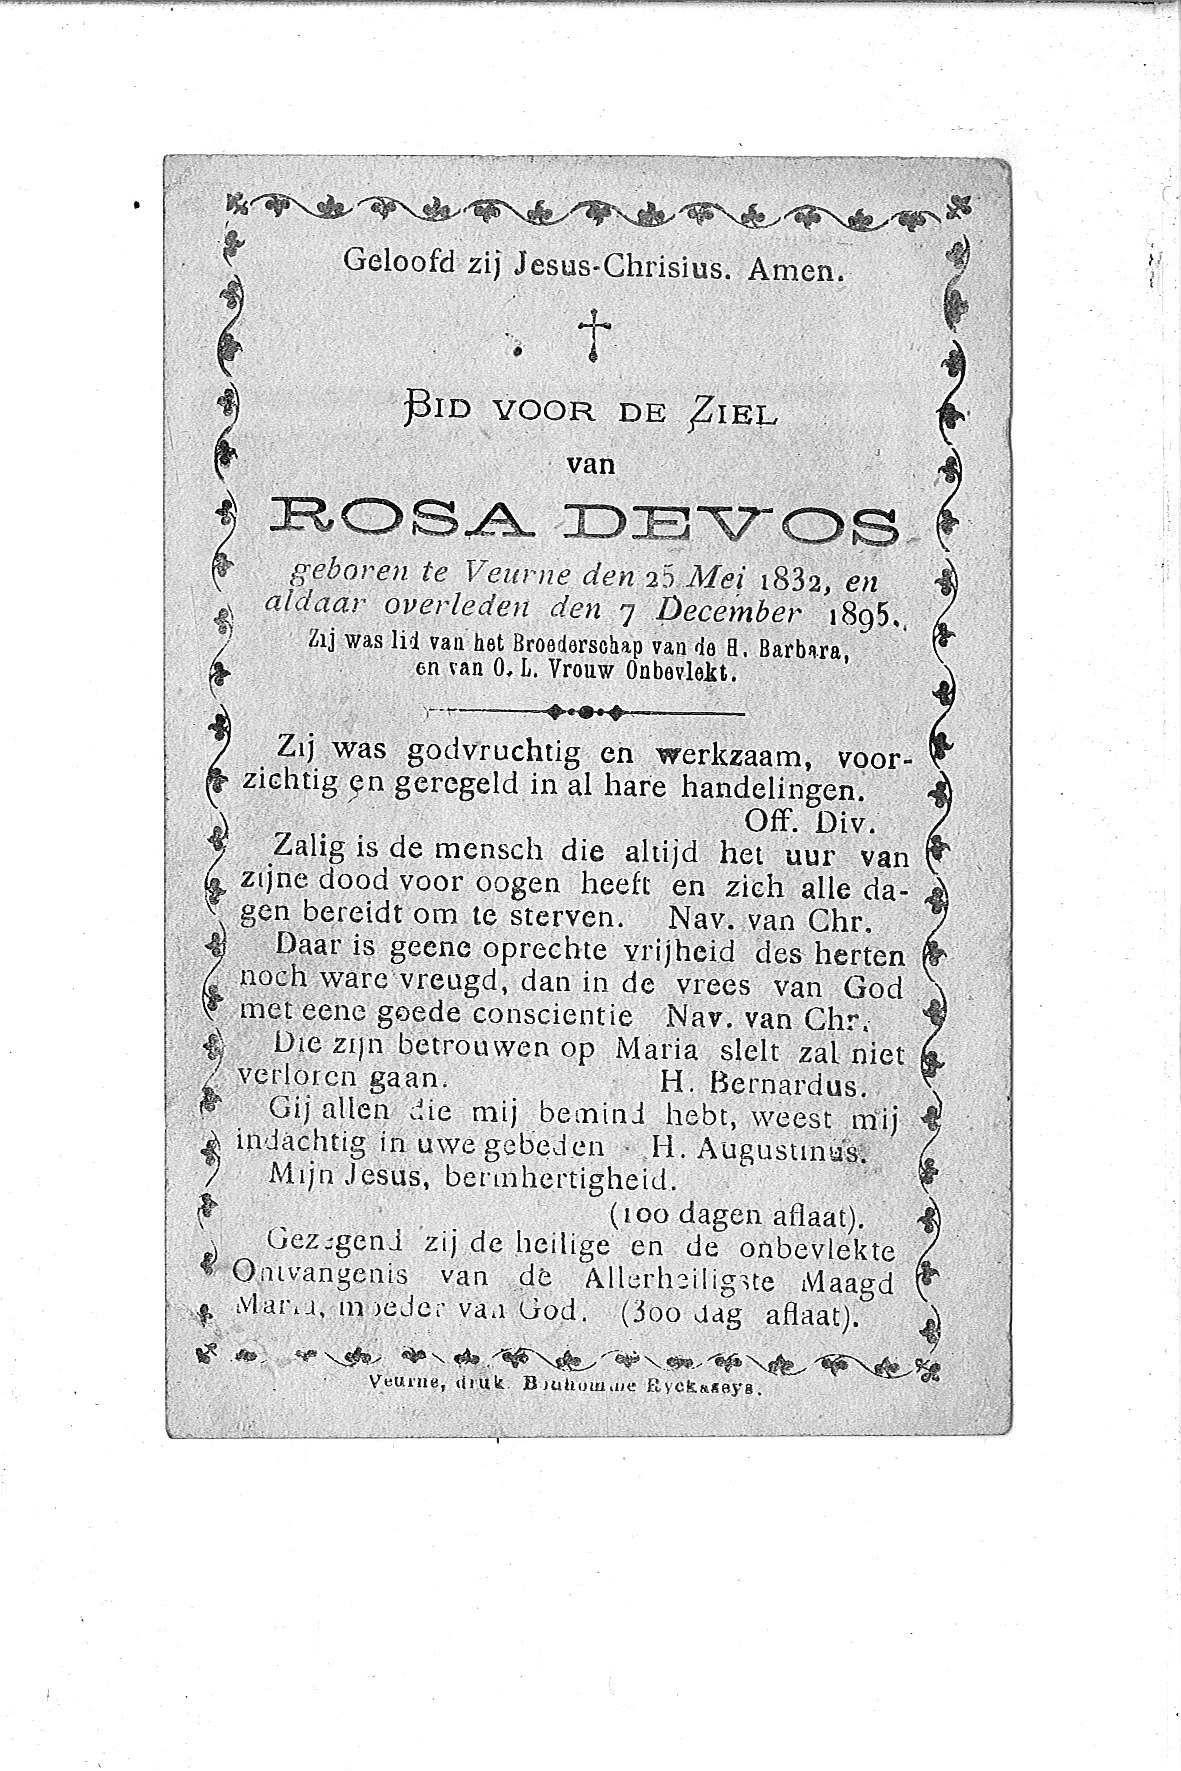 Rosa (1895) 20120306152925_00110.jpg